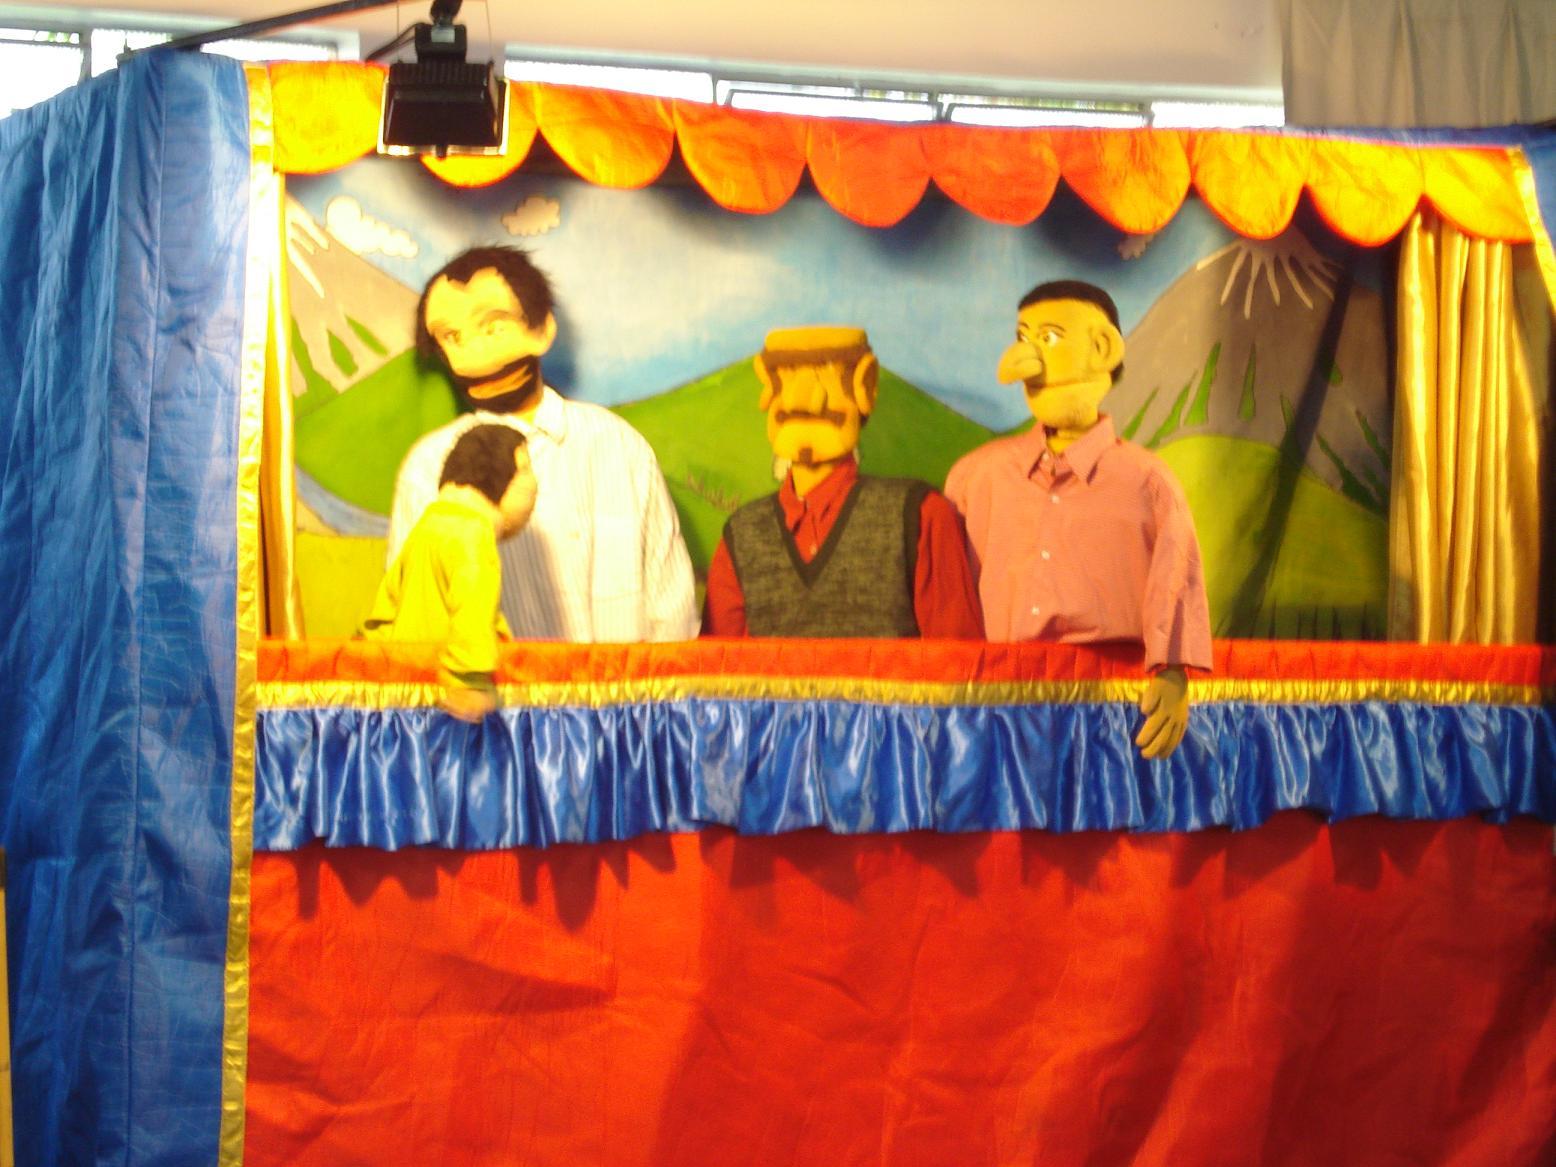 Teatro na escola: O menino pastor e o lobo